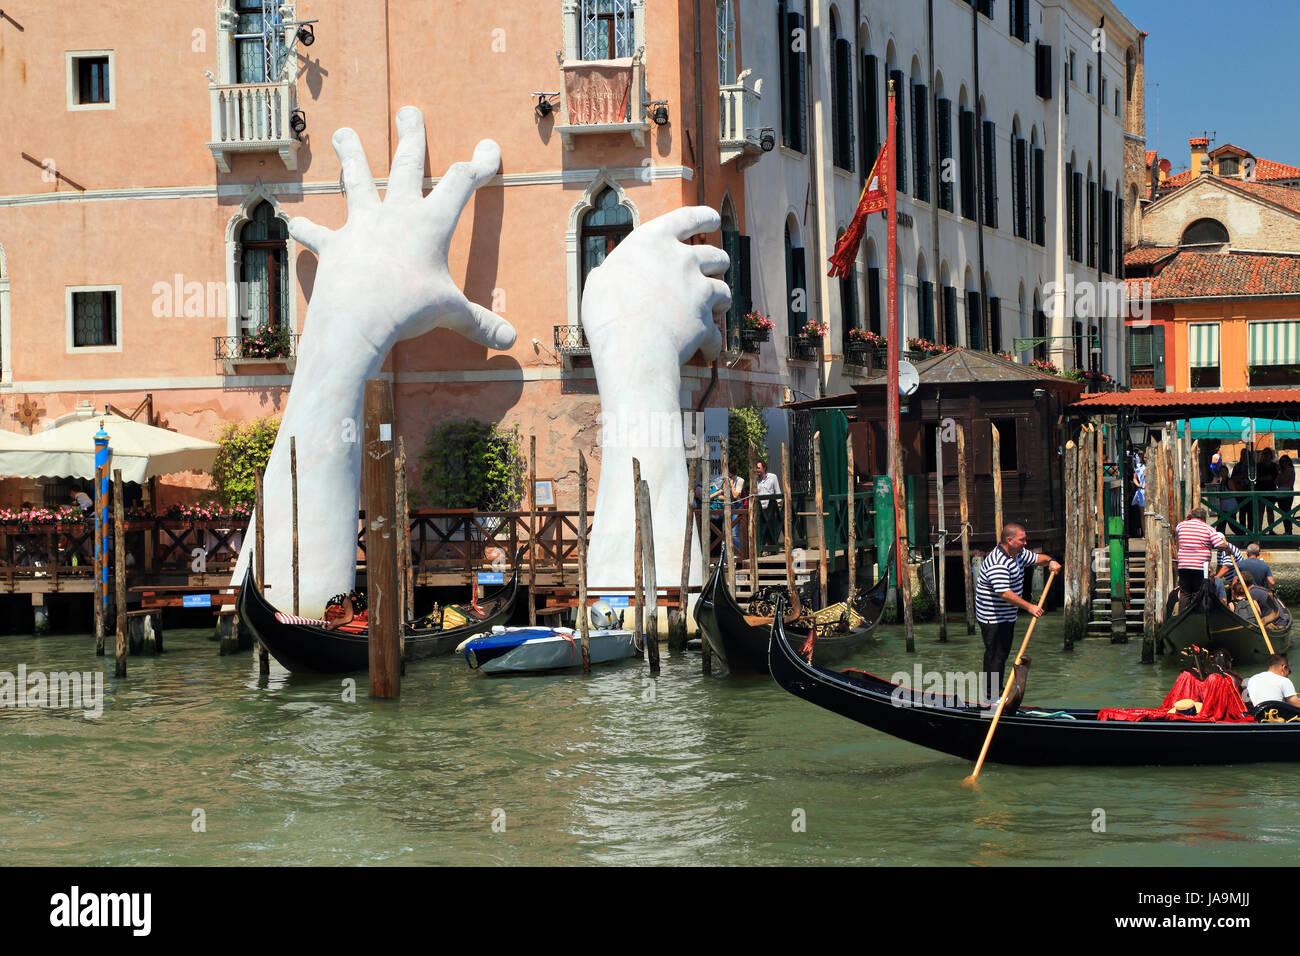 Mani gigante scultura a Venezia da Lorenzo Quinn Immagini Stock